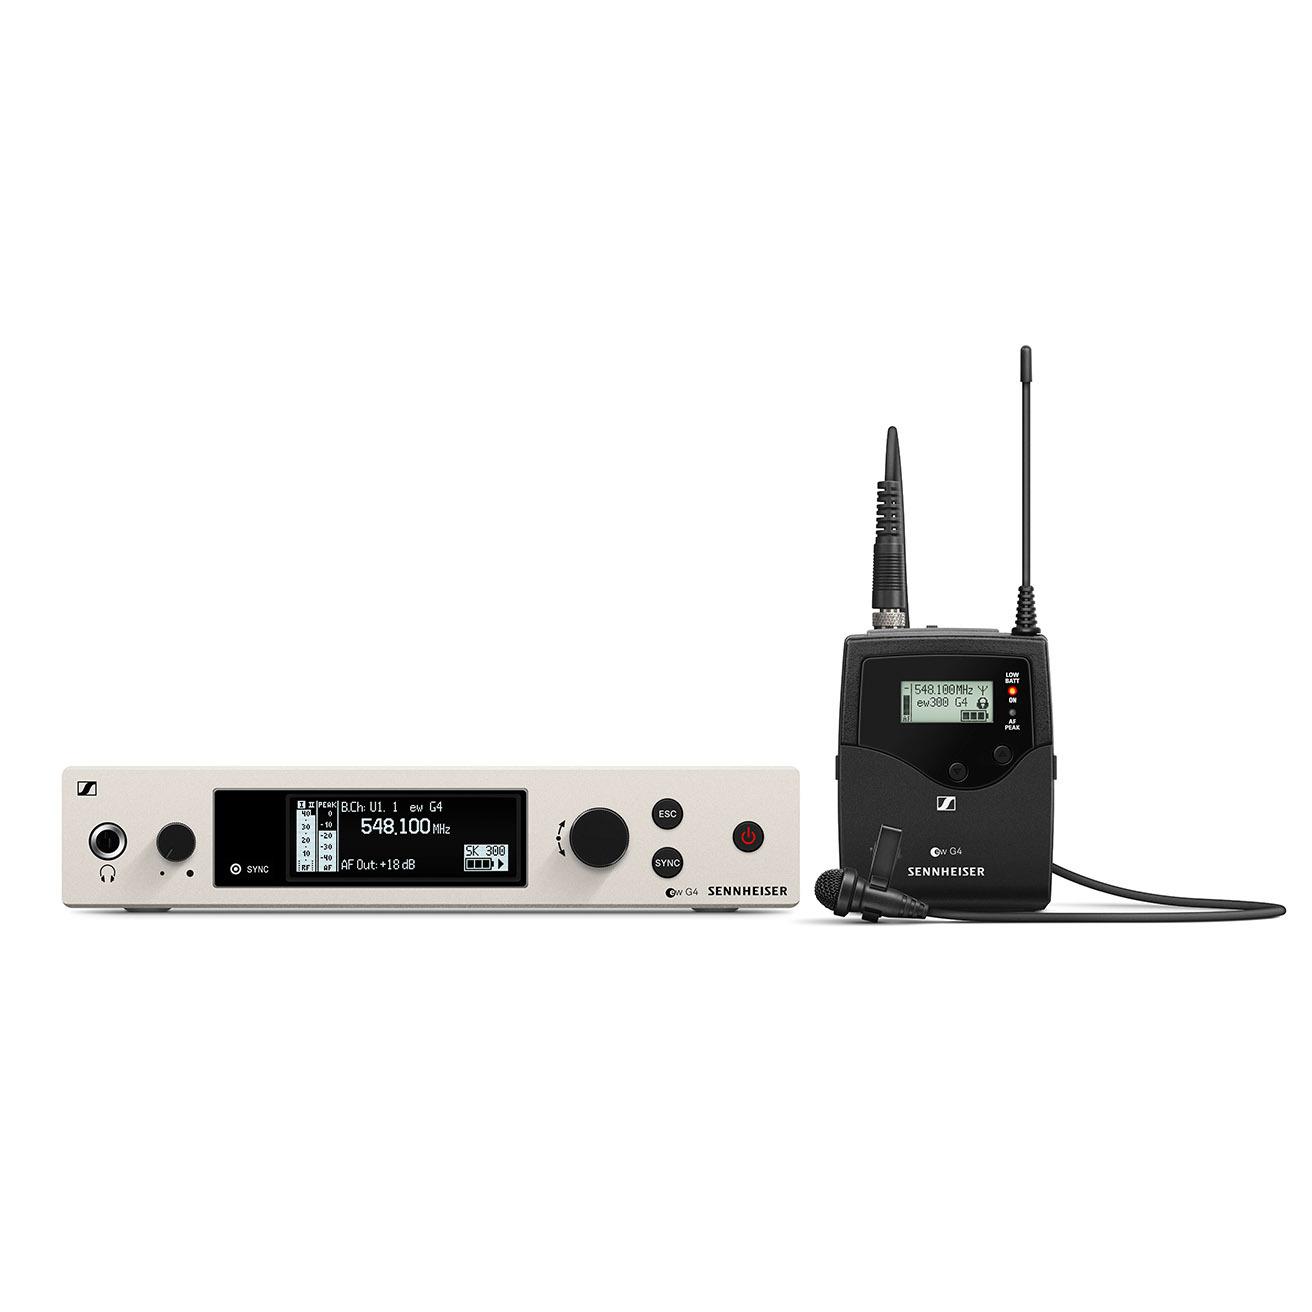 Sennheiser EW 300 G4-ME2-RC Wireless Lavalier Microphone System